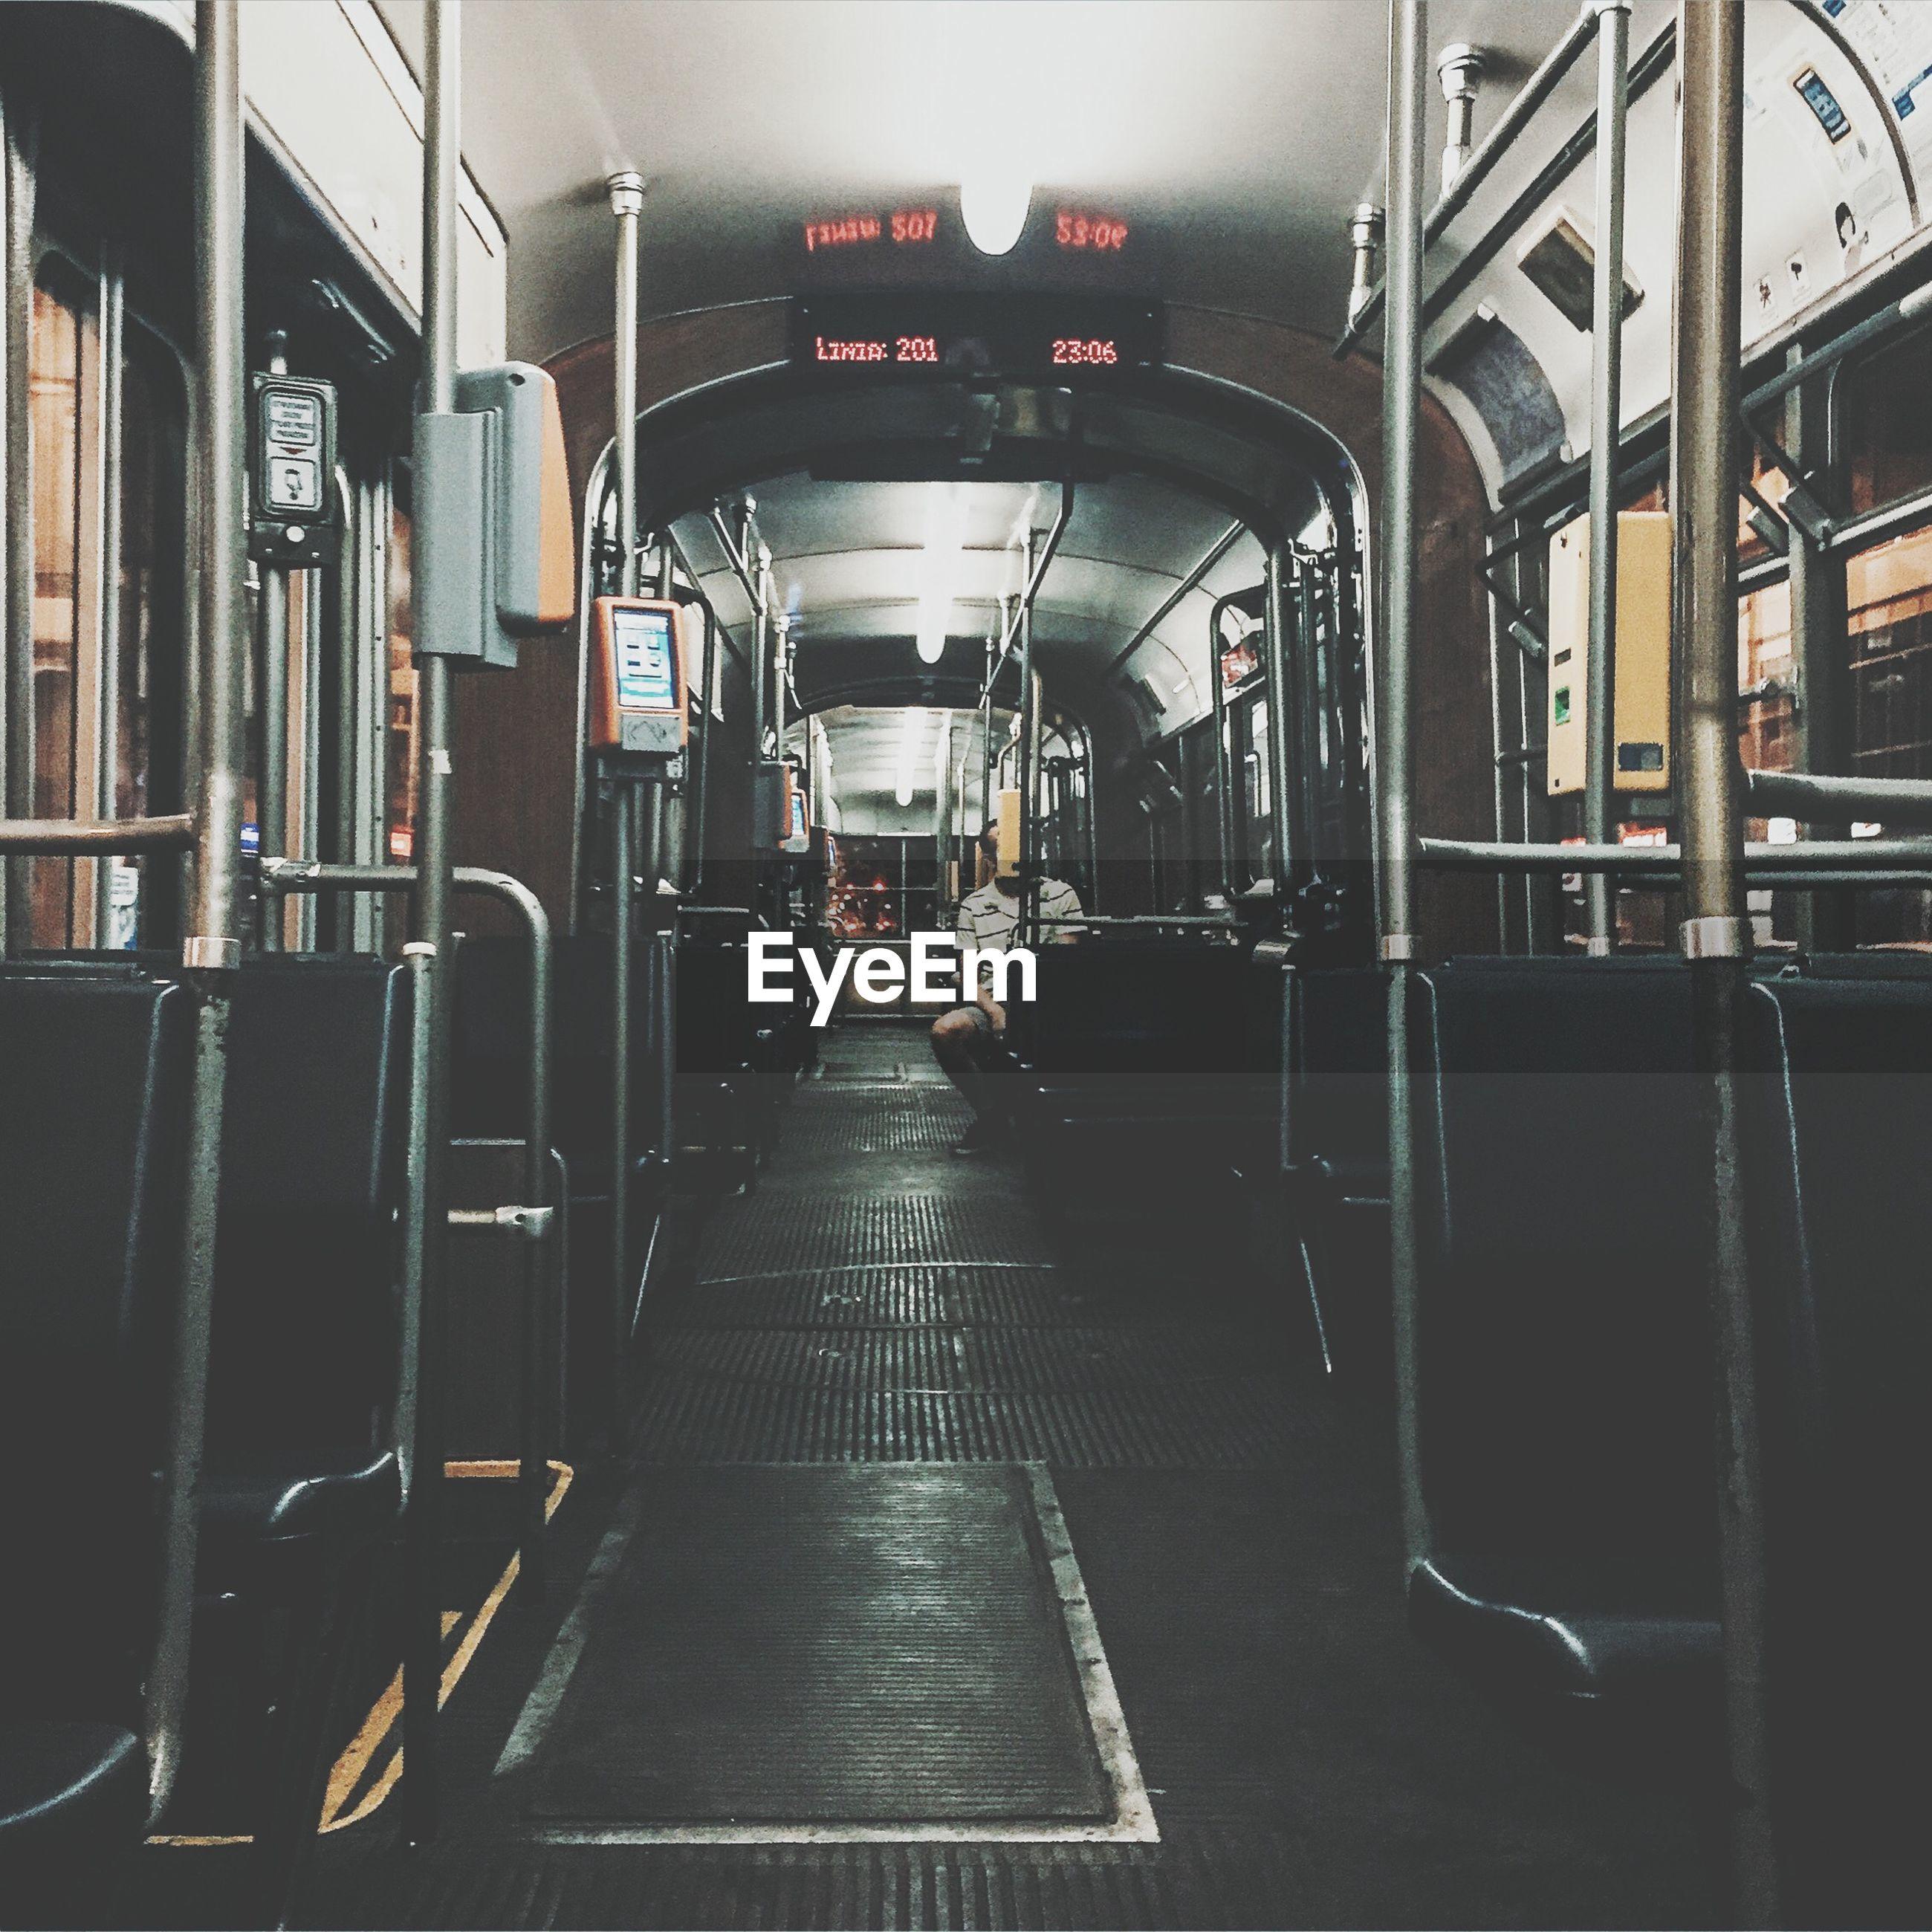 Man sitting in tram